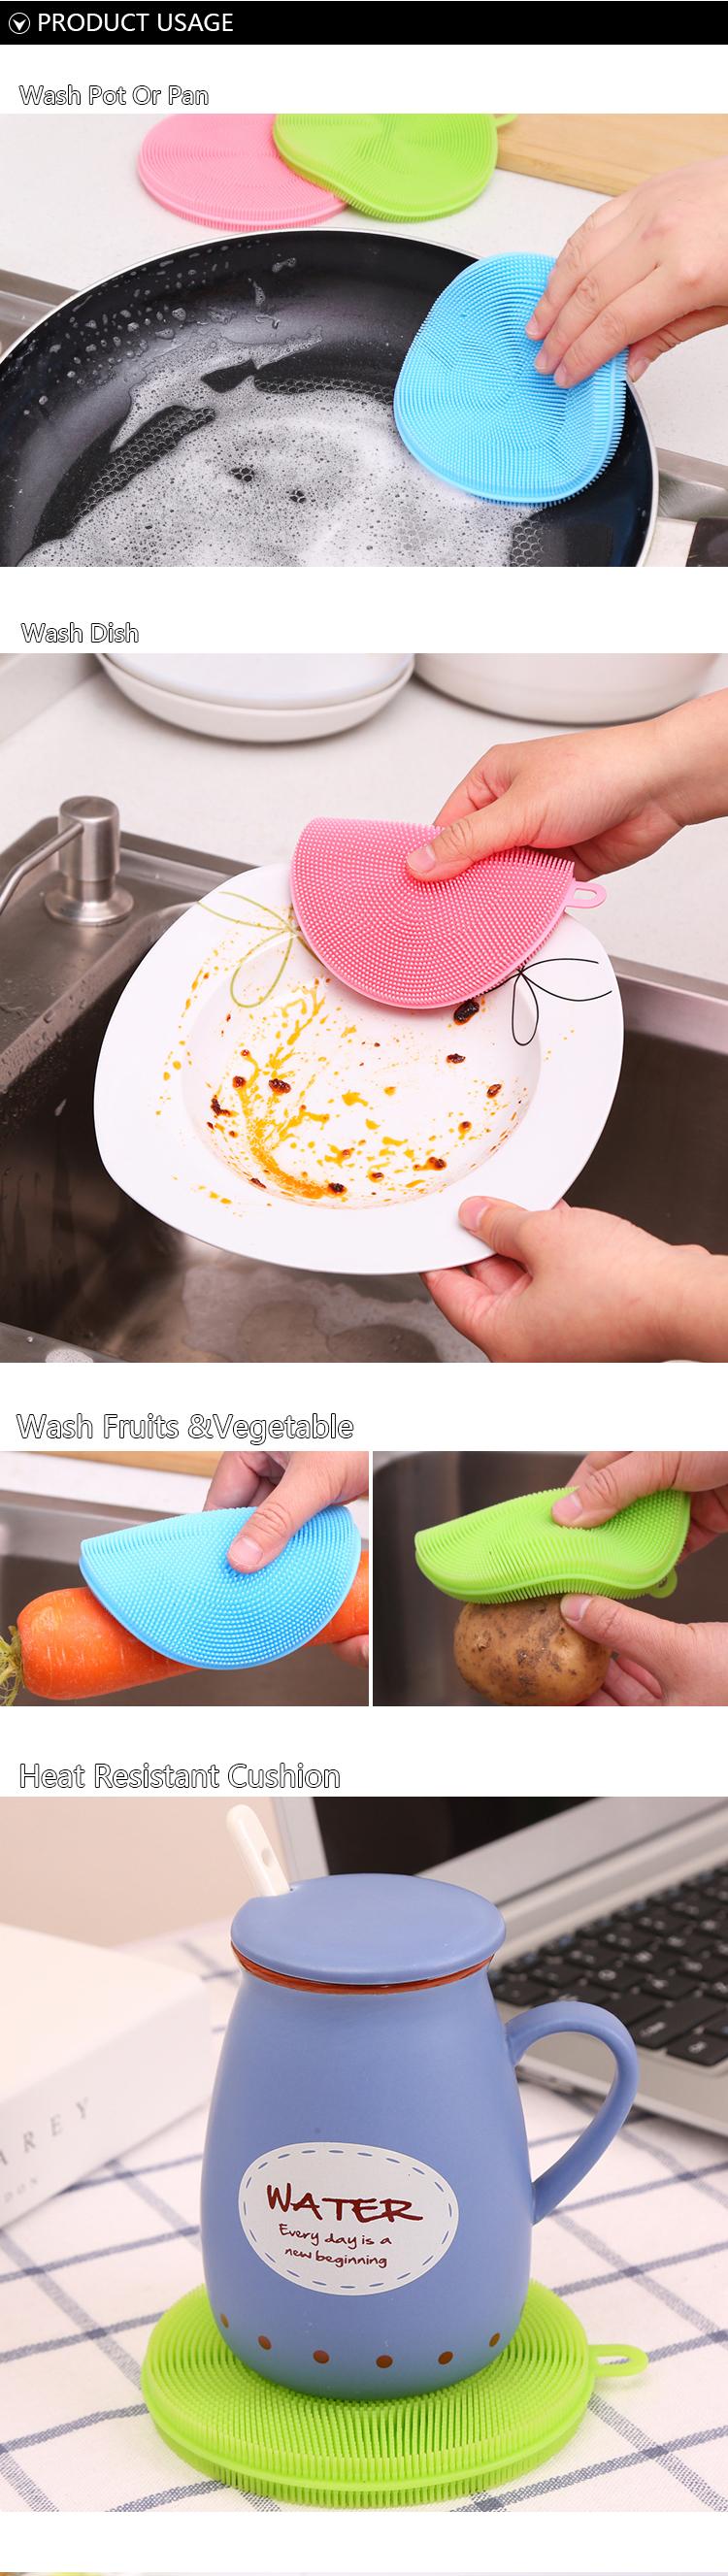 dishwashing brush kitchen